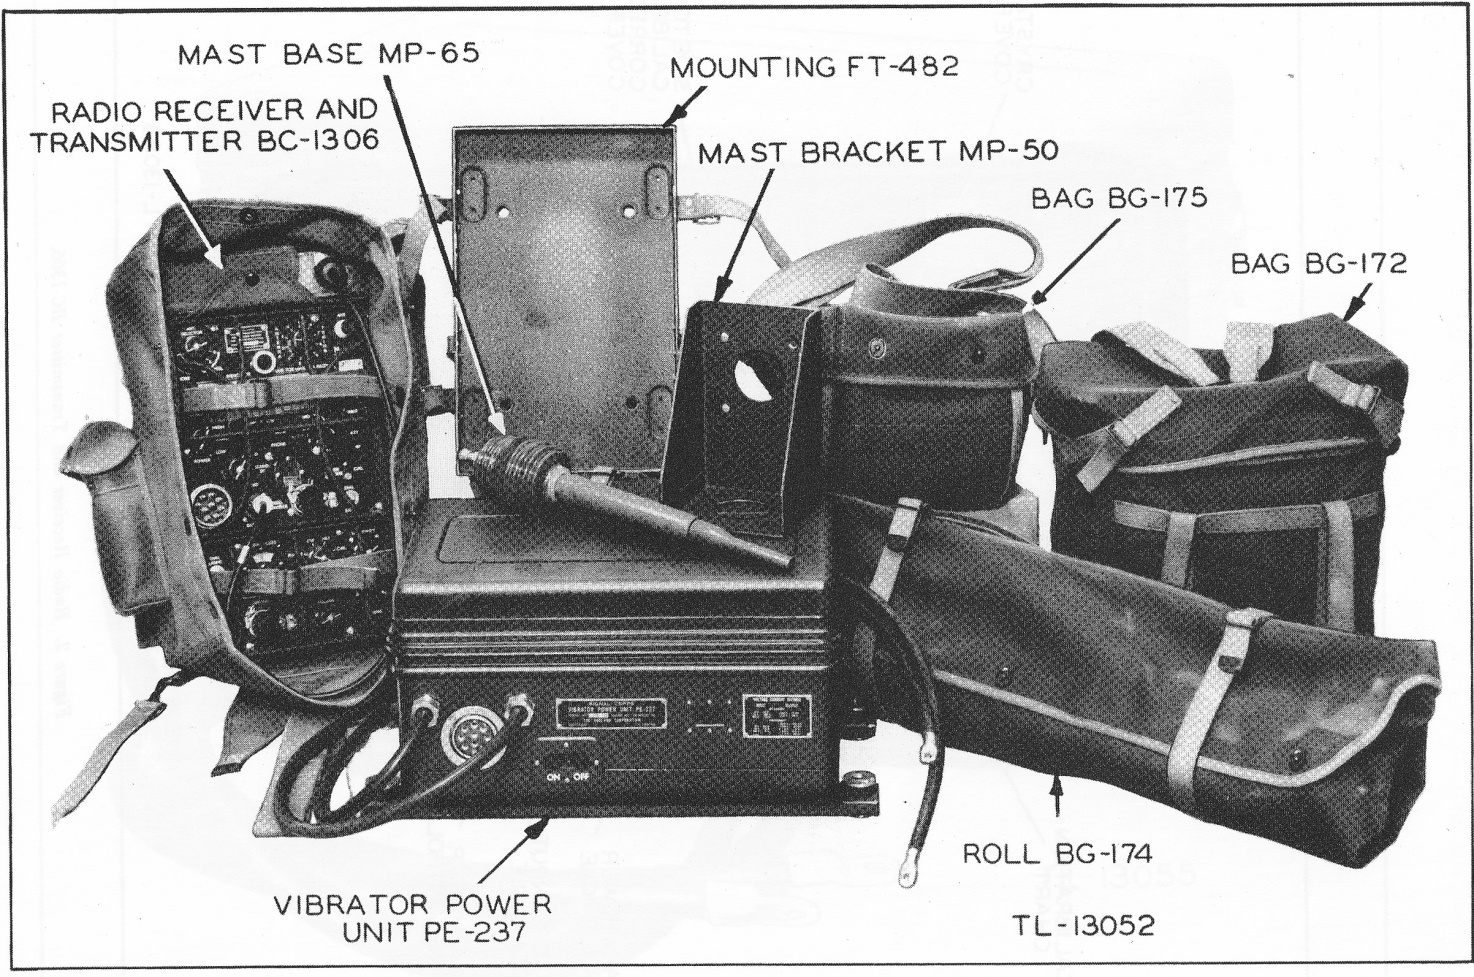 D:\Archiv Nemeth\Fzg-Gerät-Ausrüstung\Gerät\Nachrichtengerät\BH-US\SCR-694\SCR-694.jpg